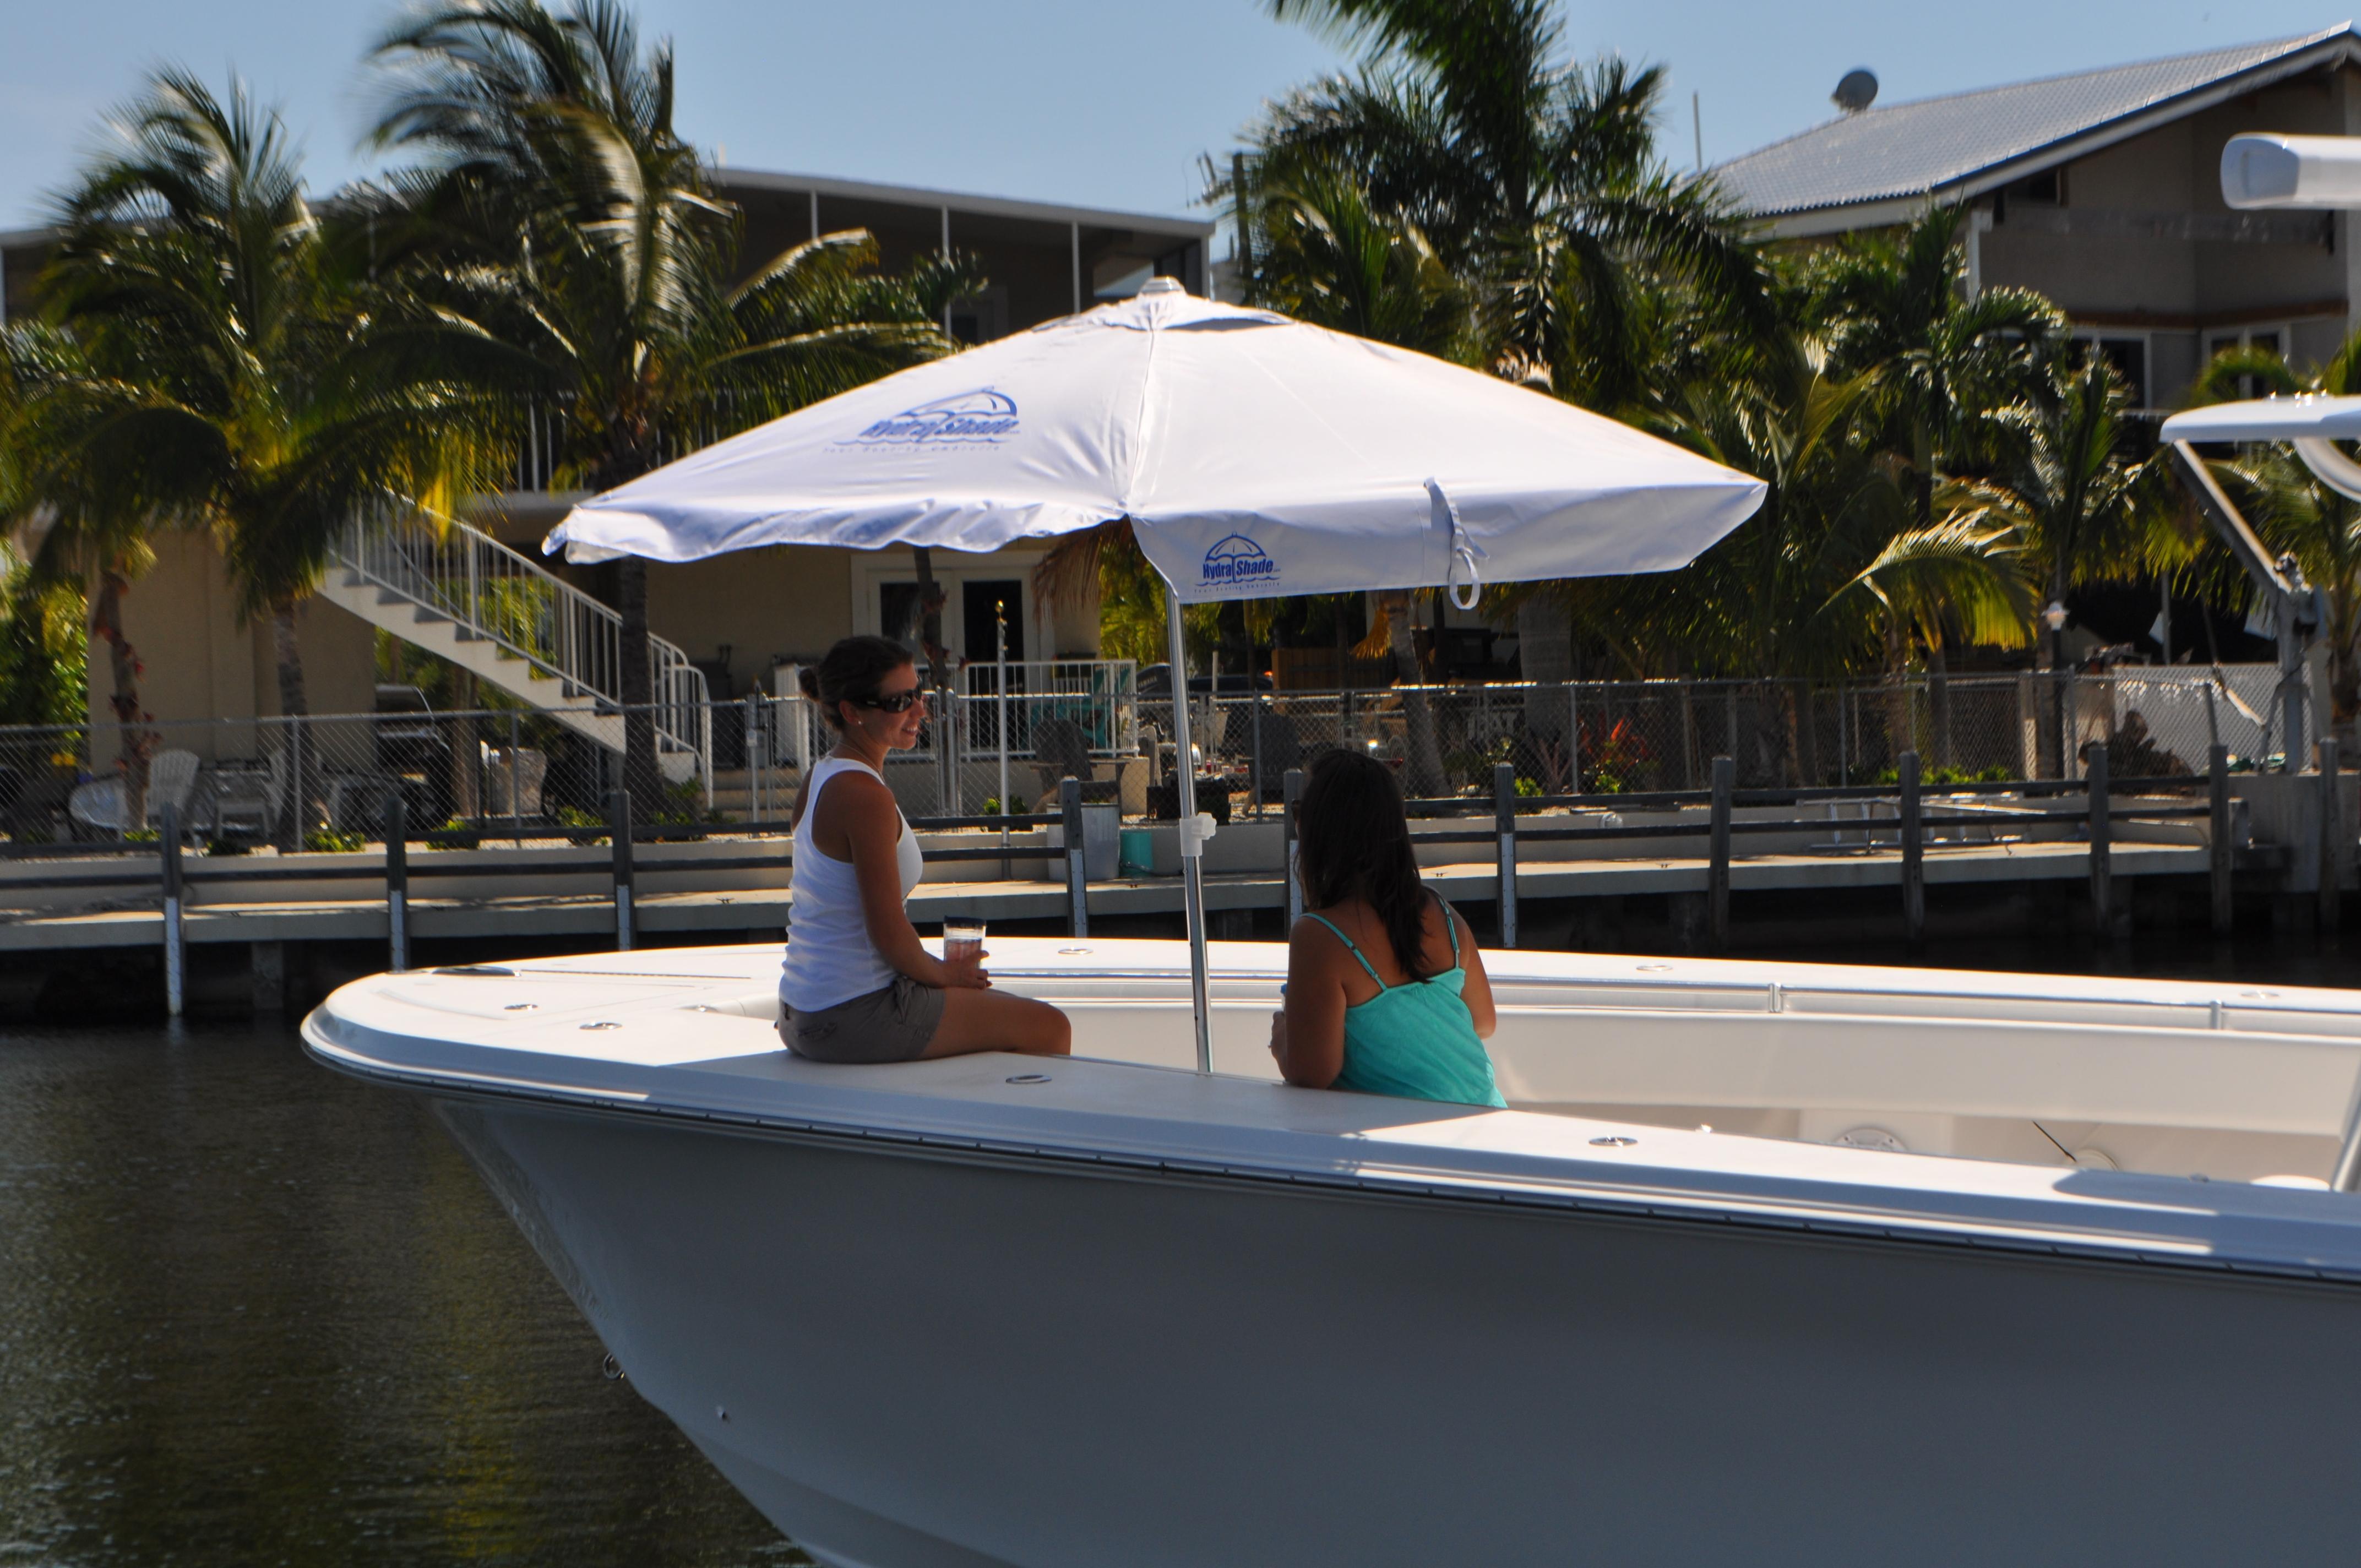 Hydra Shade 8 Square Boating Amp Beach Umbrella 4 Piece Kit